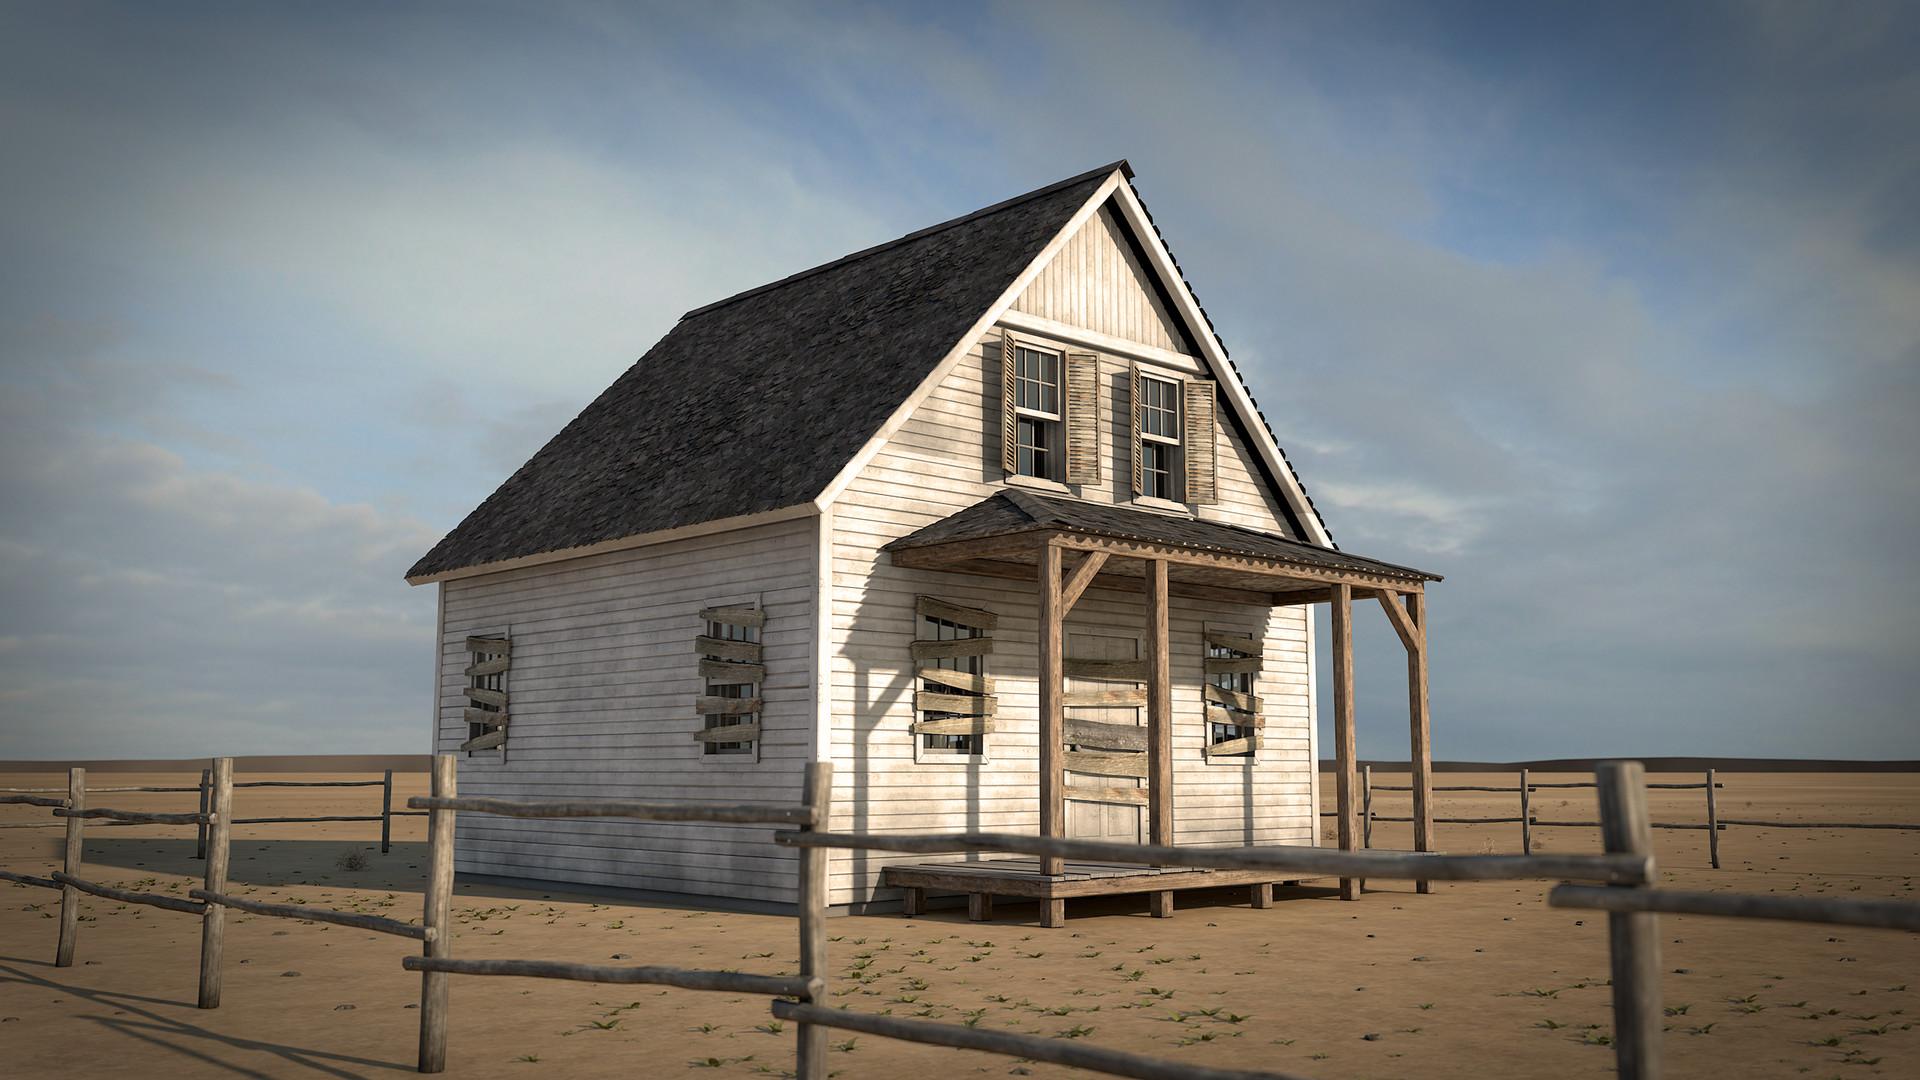 Dmitry Kopeykin - Abandoned House - Free Project (Cinema 4D)